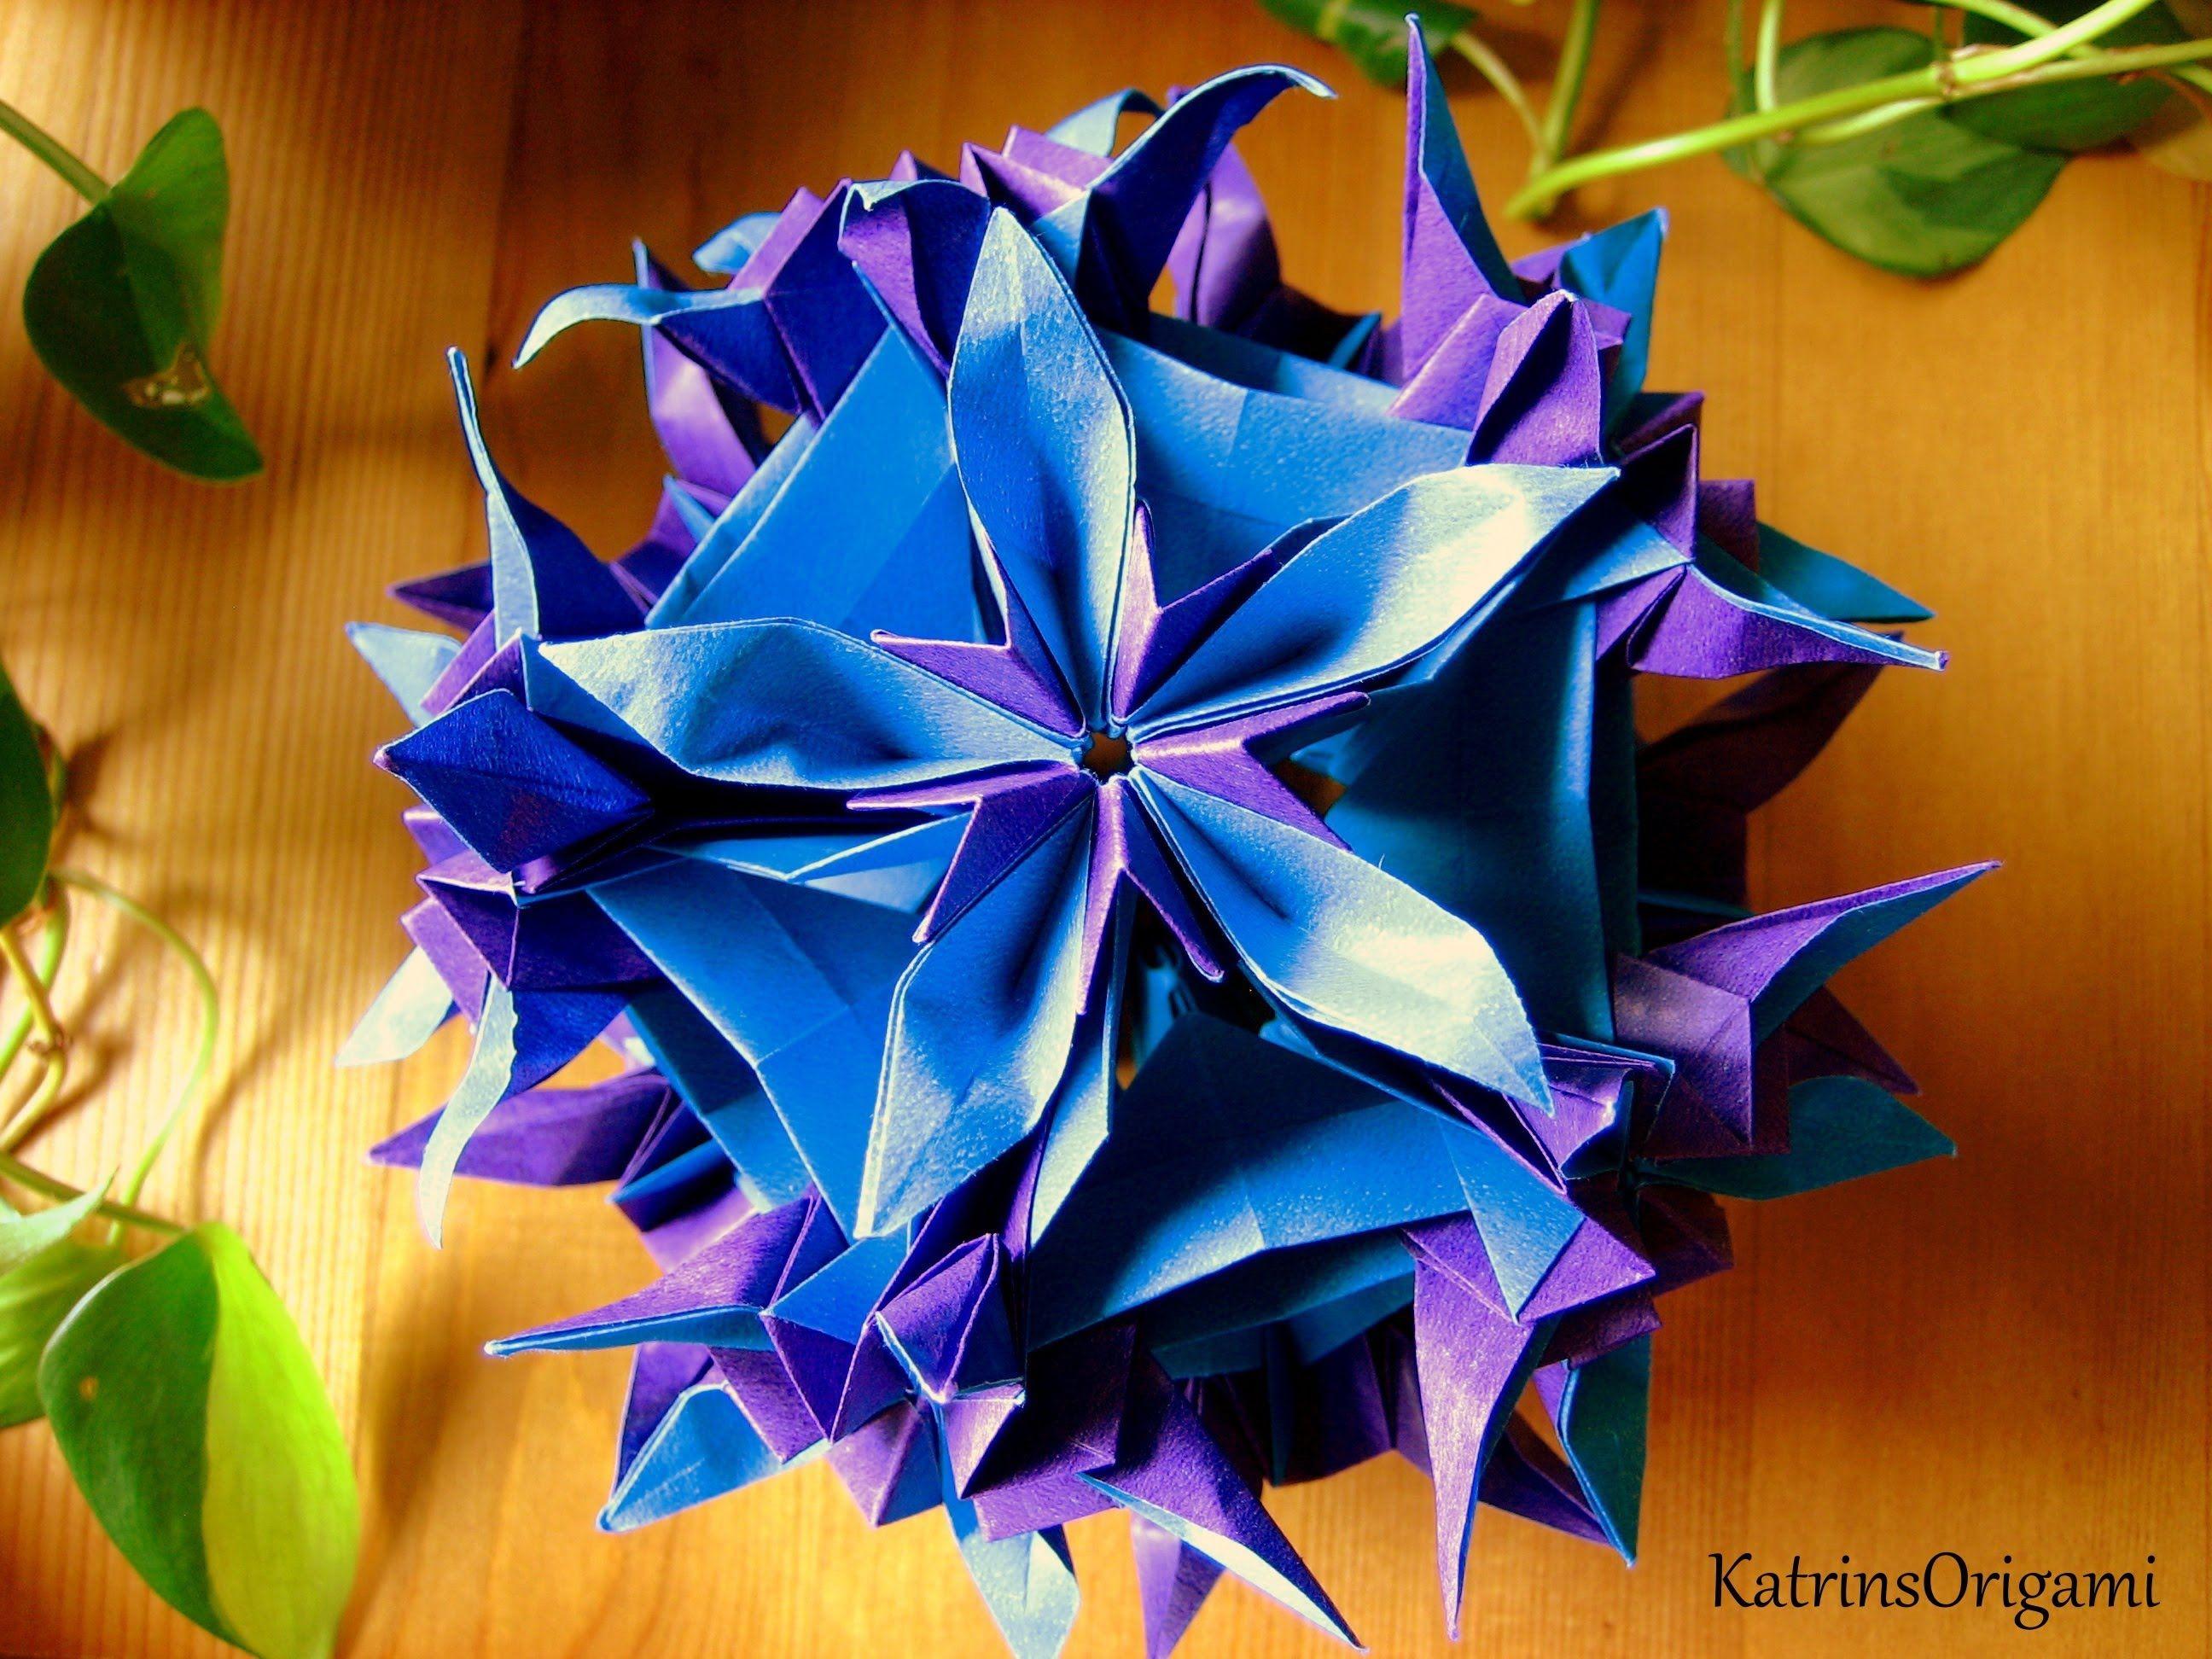 Photo of Origami ✿ Spides floral ✿ Kusudama